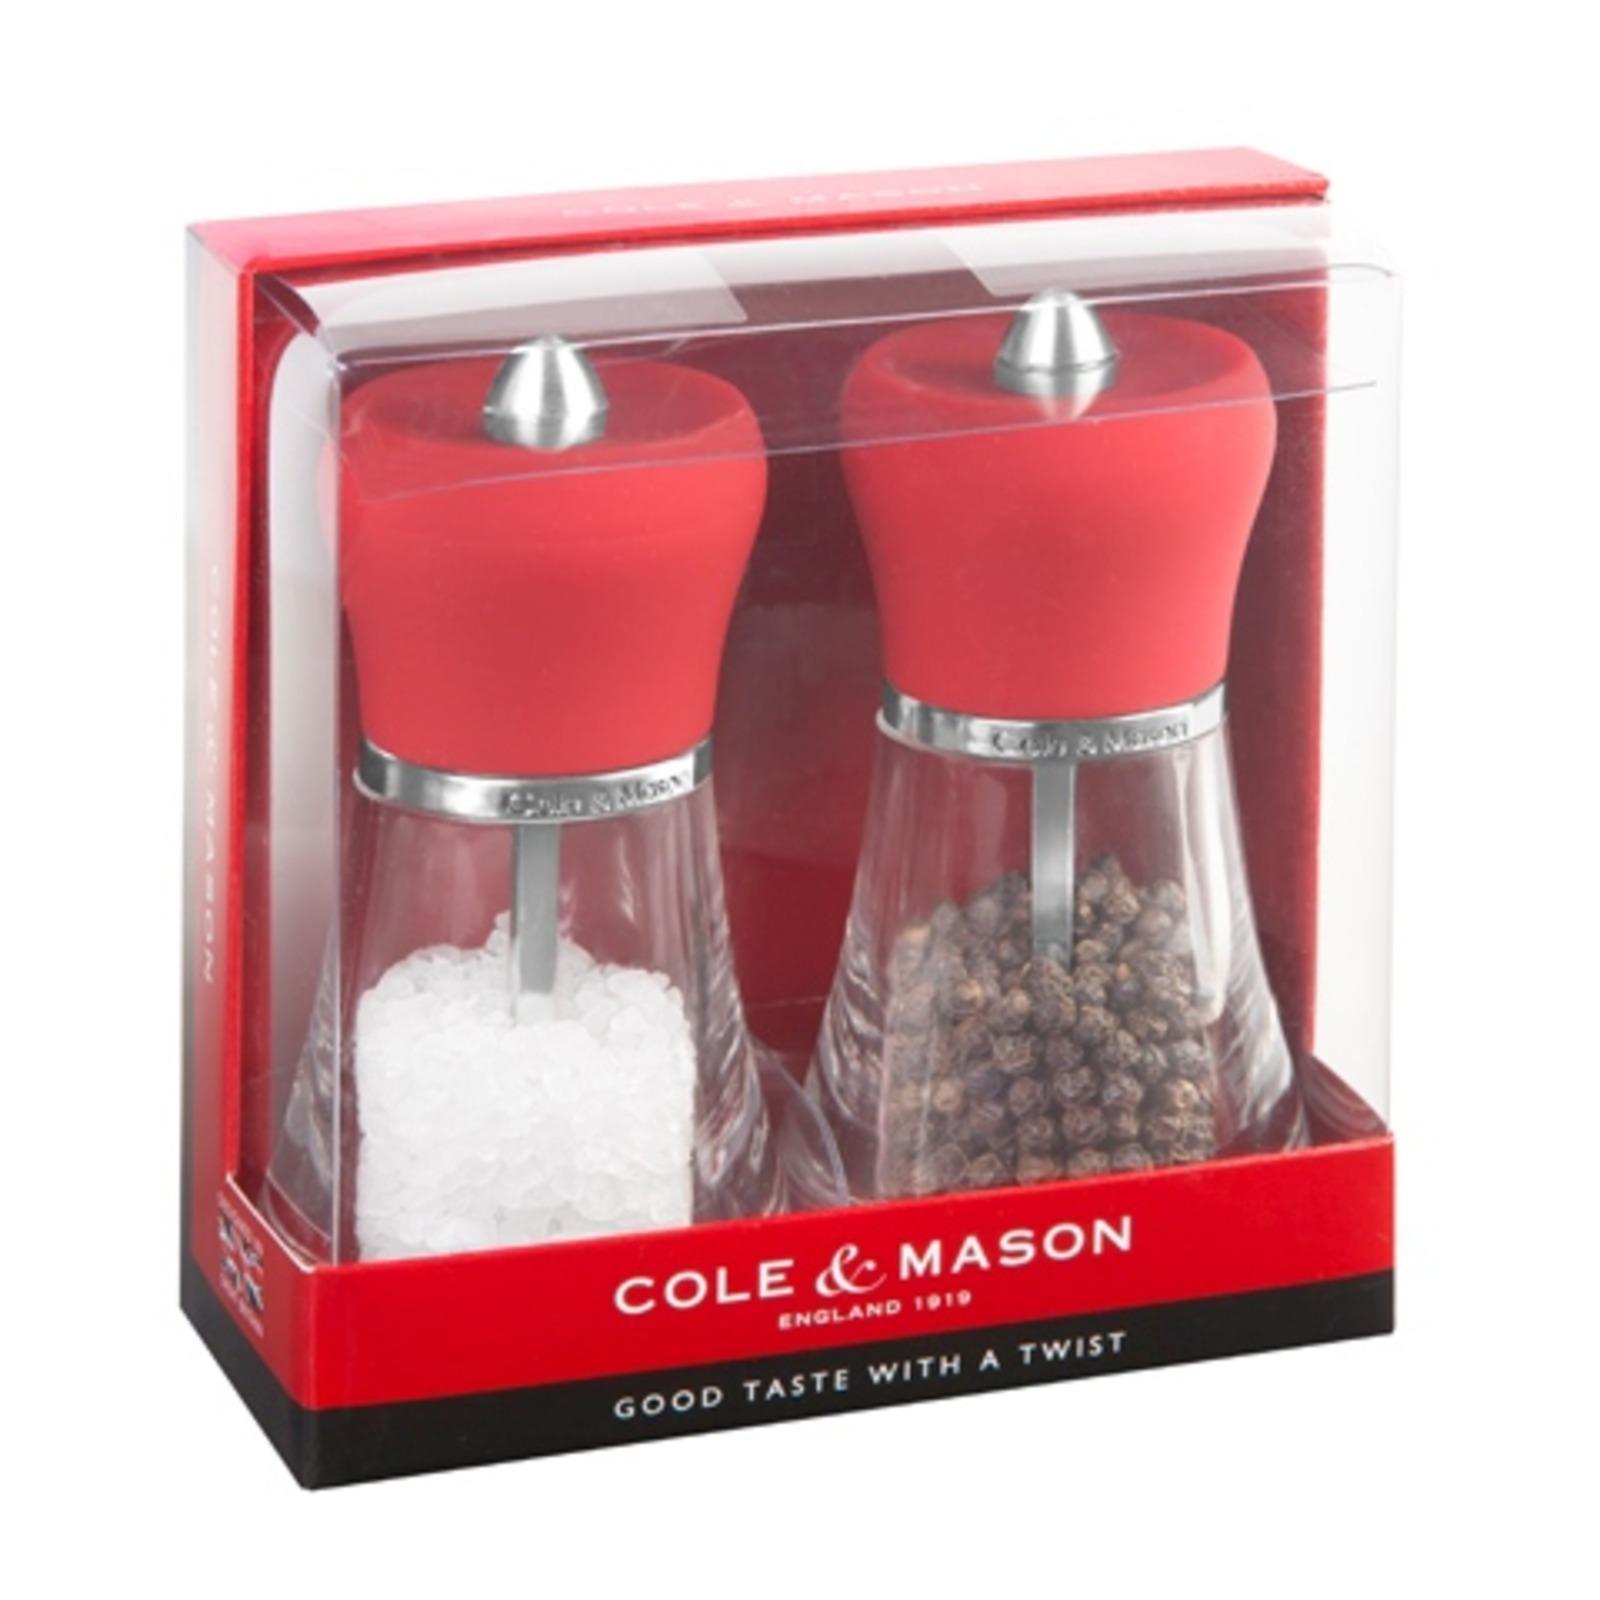 COLE&MASON Acrylic Salt & Pepper Mill Gift Set H12cm Red